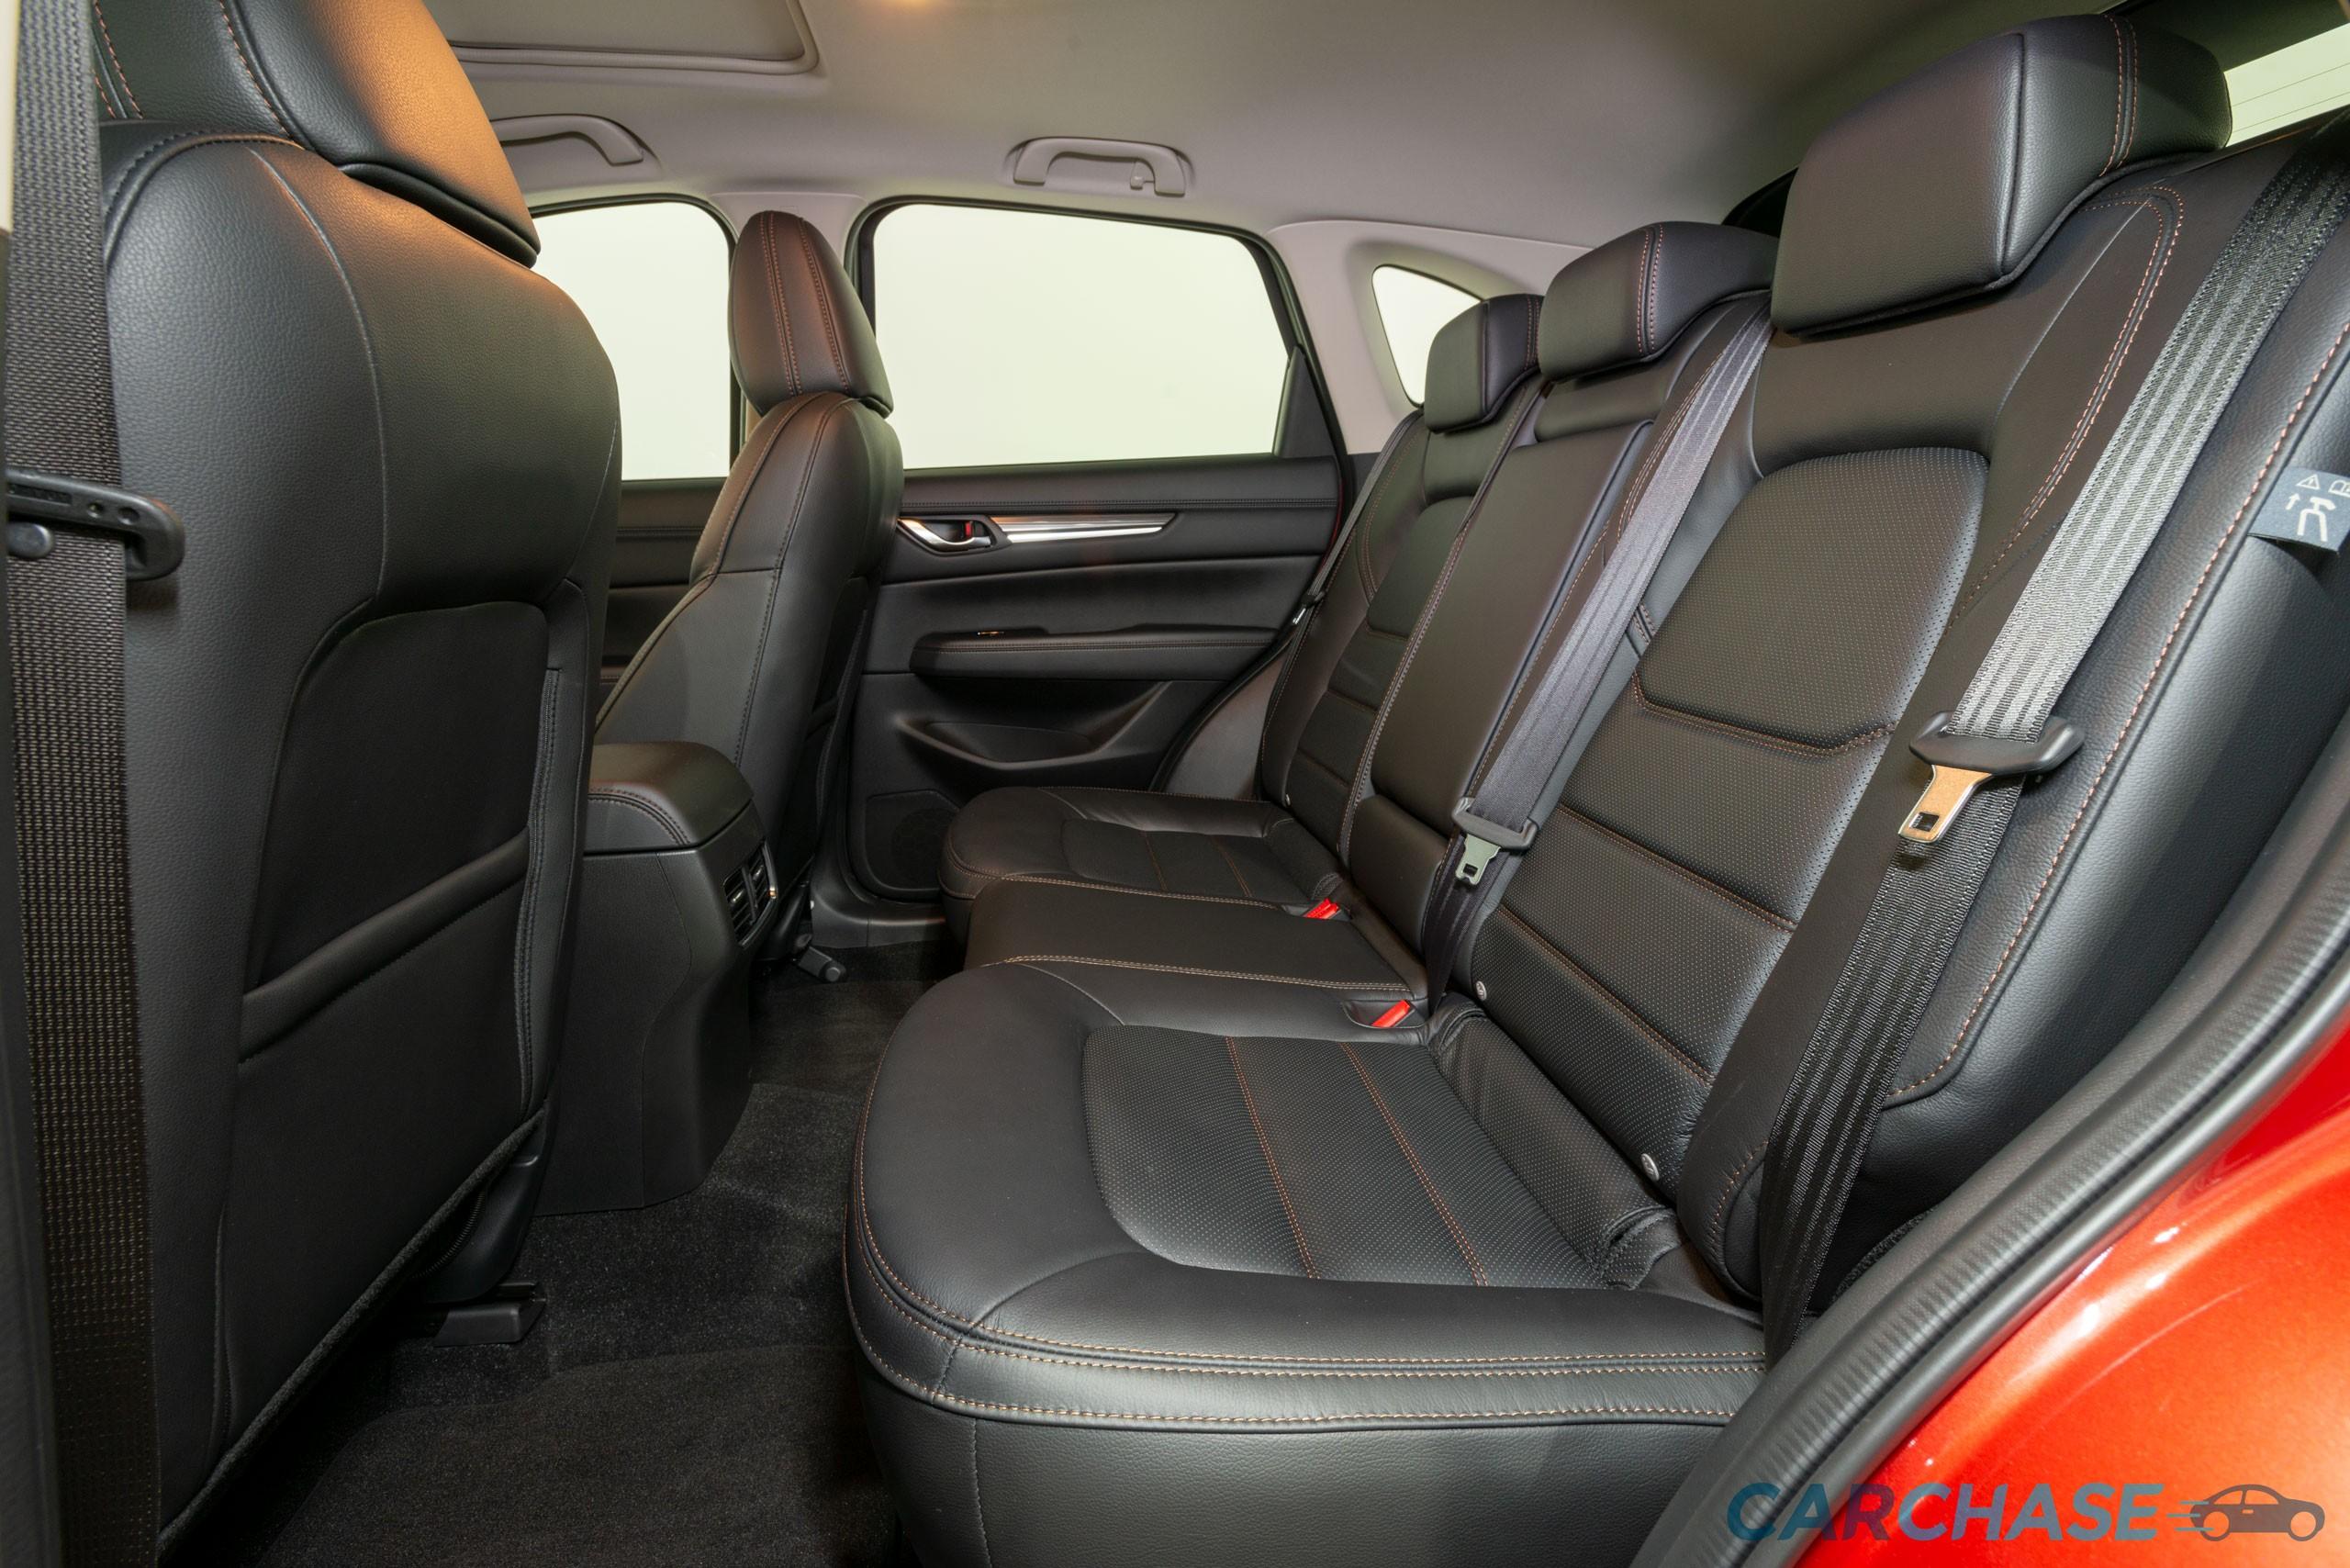 Image of passenger rear profile of 2018 Mazda CX-5 GT